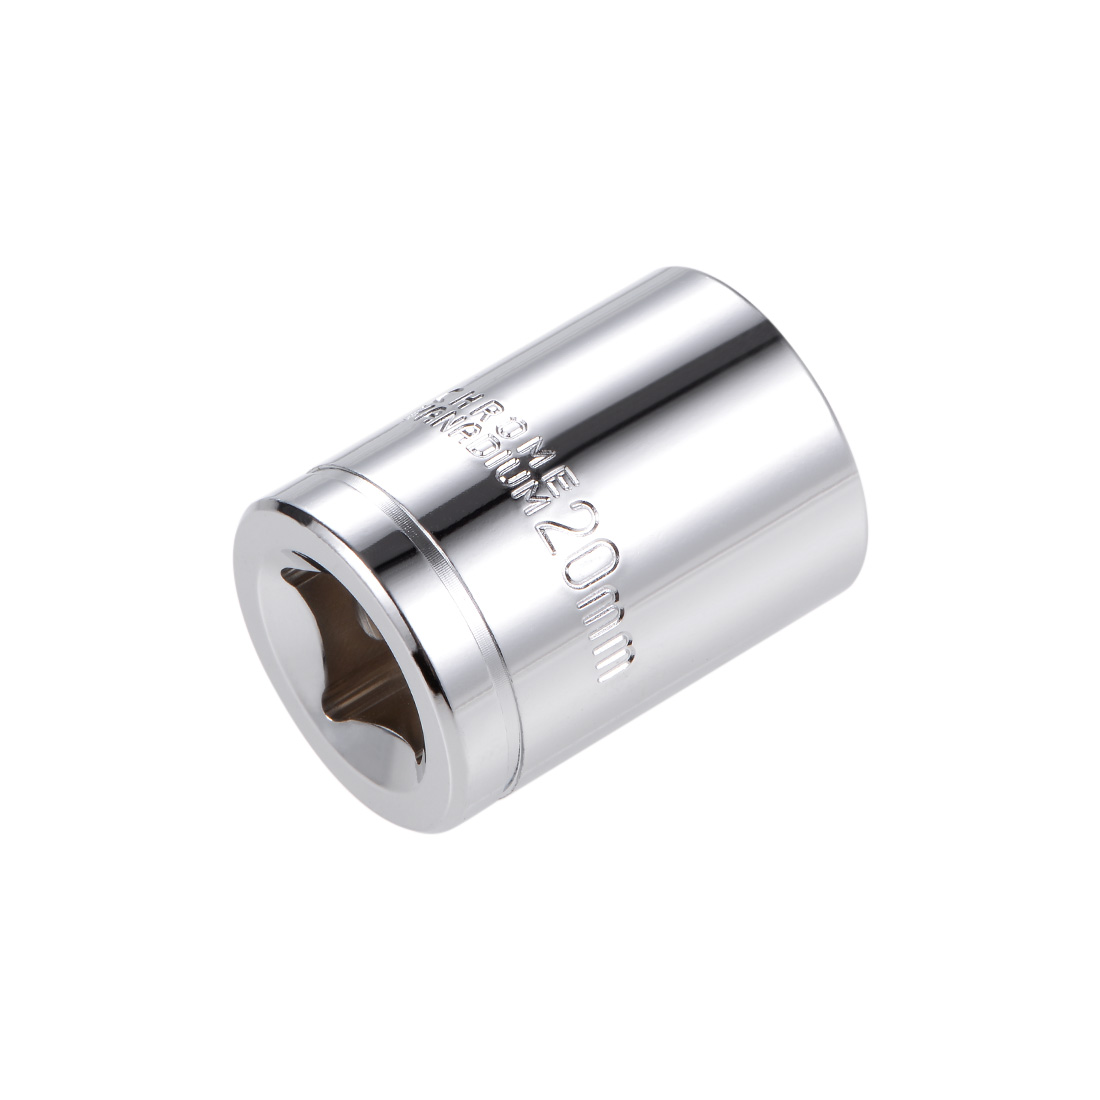 1/2-inch Drive E20 Universal Spline Socket Shallow 12 Point Cr-V Steel